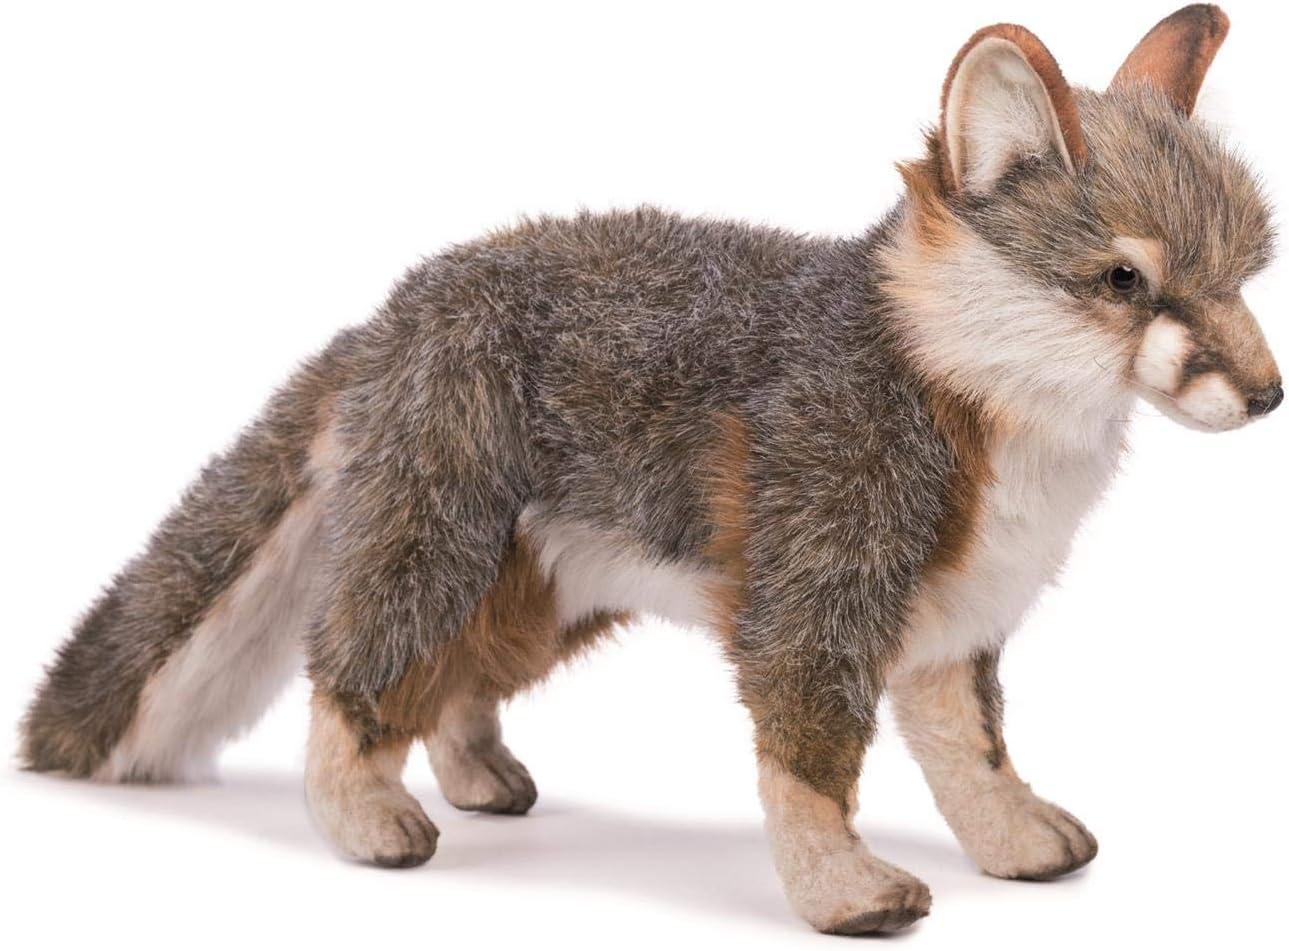 B001ISQUAW HANSA Fox Plush, Gray 71kAf26GKIL.SL1500_